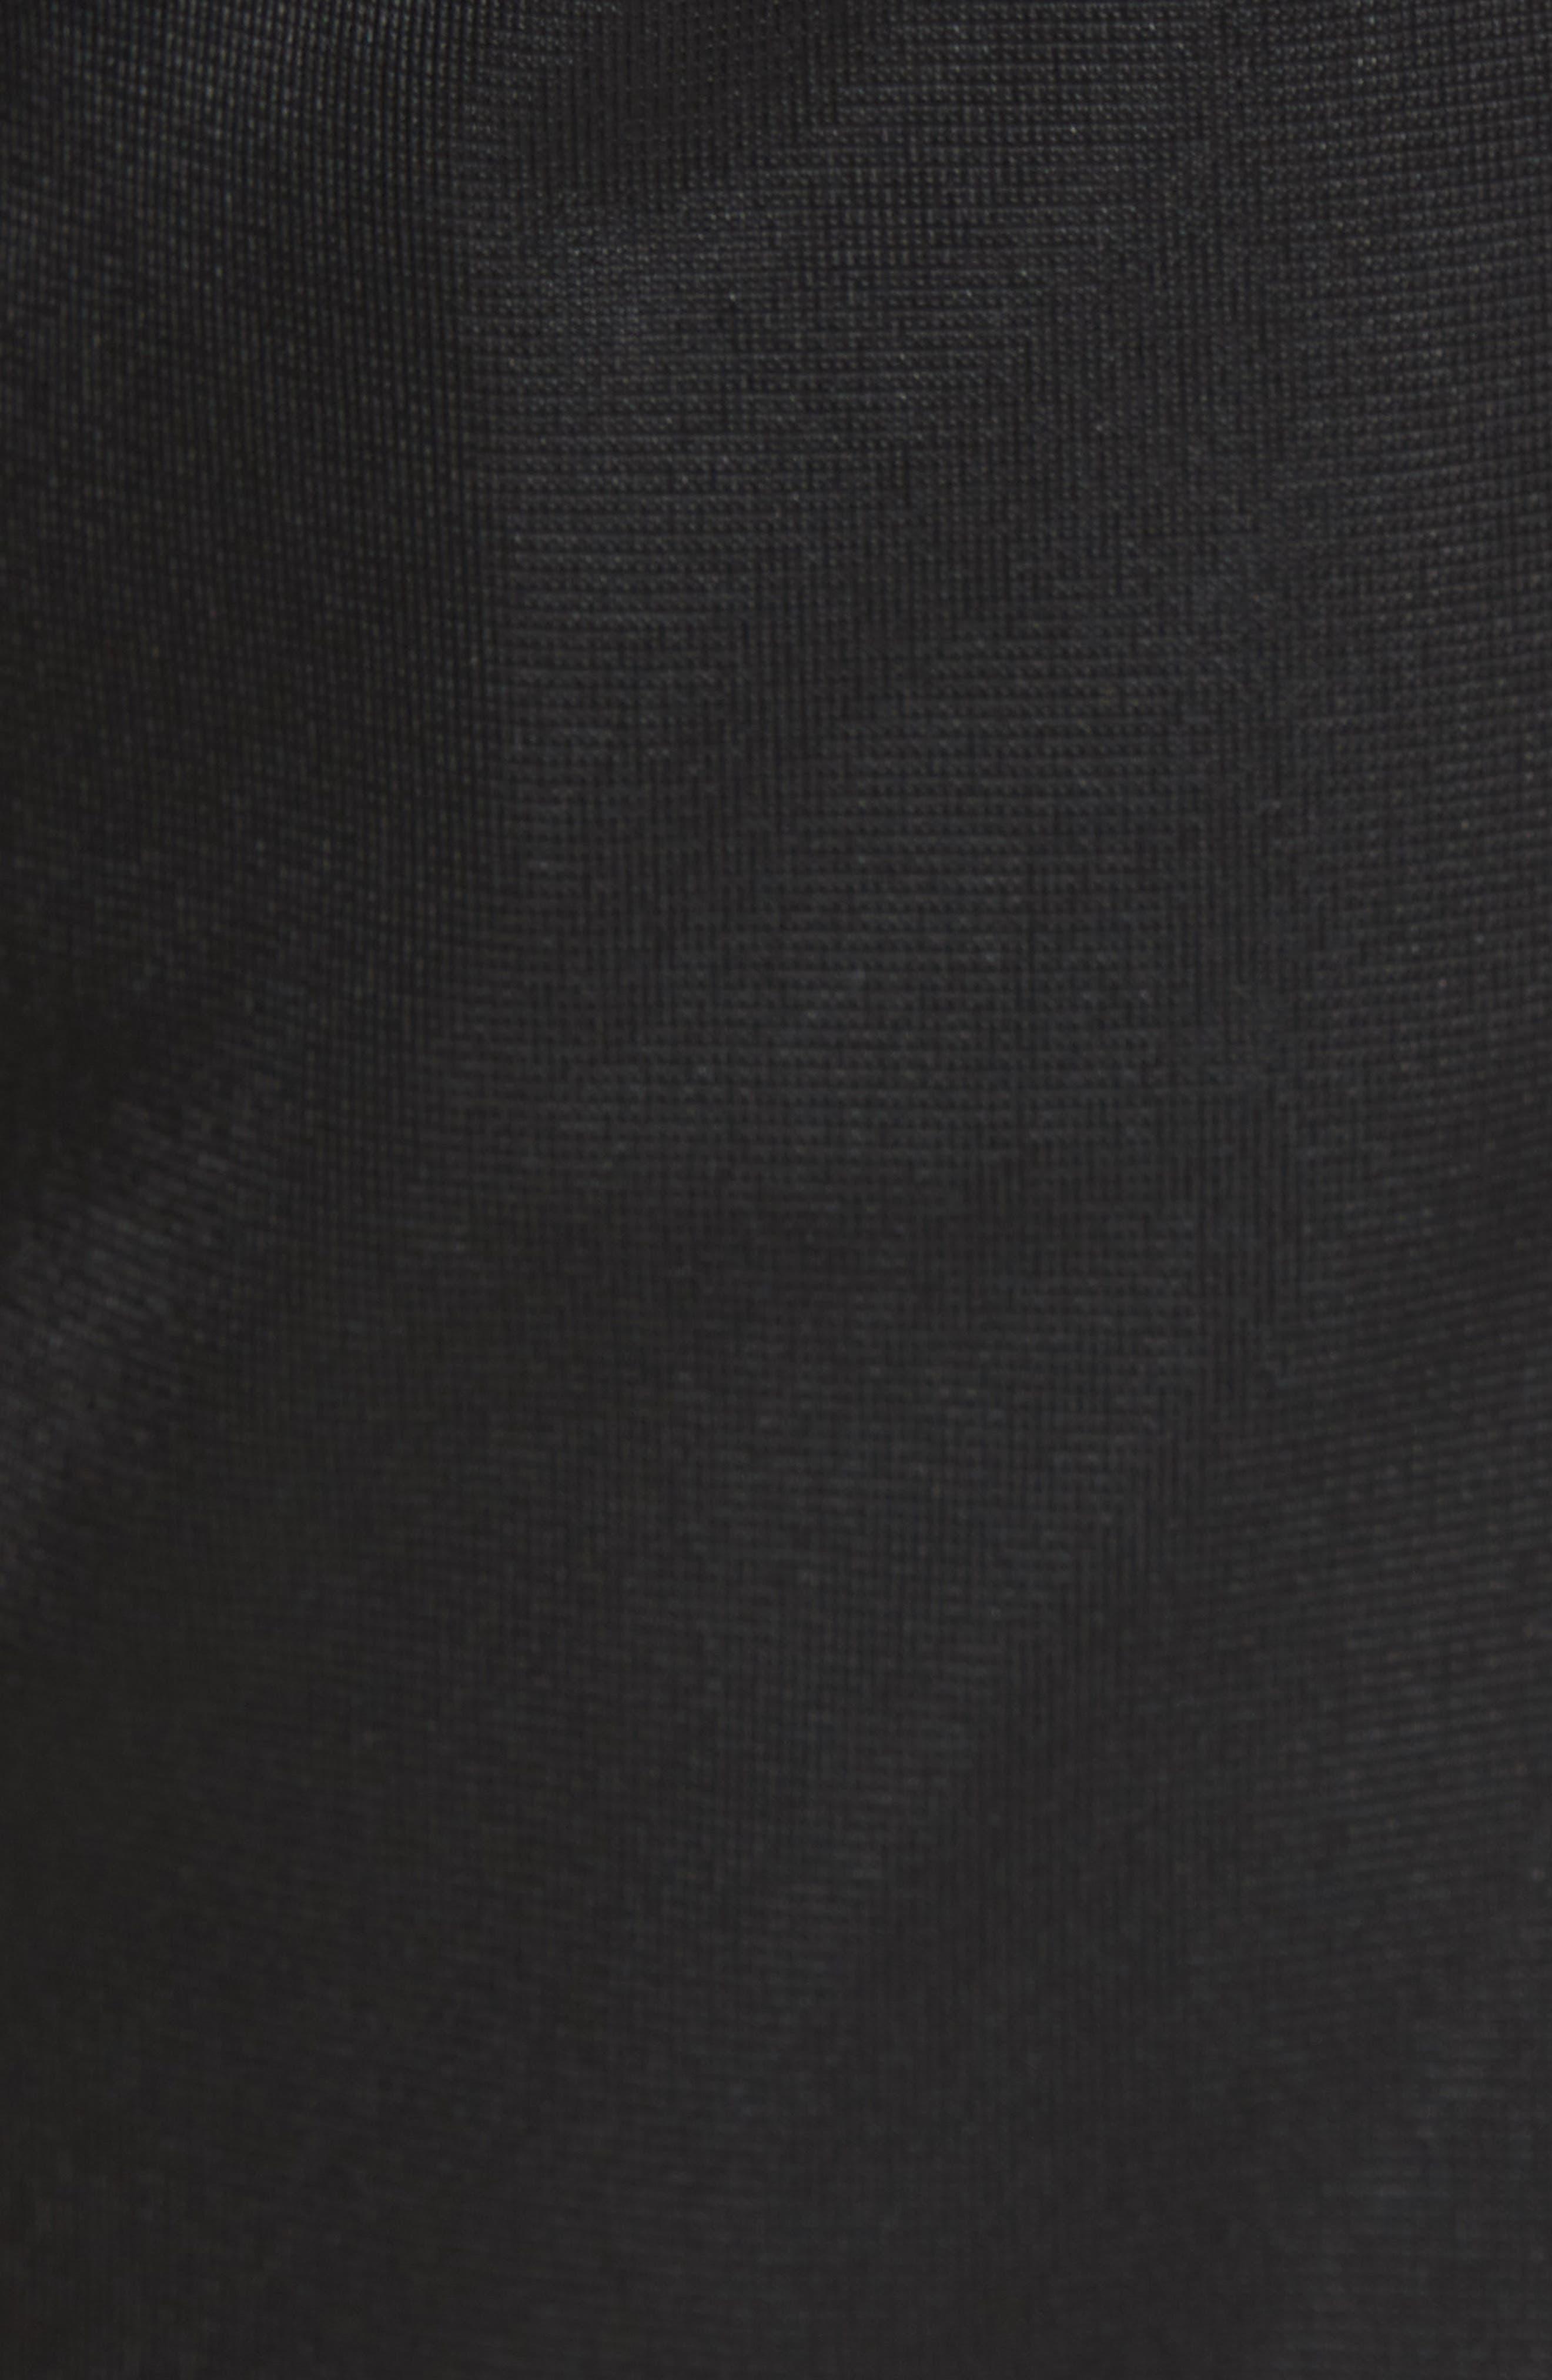 Racing Track Pants,                             Alternate thumbnail 5, color,                             Black/ White Gold